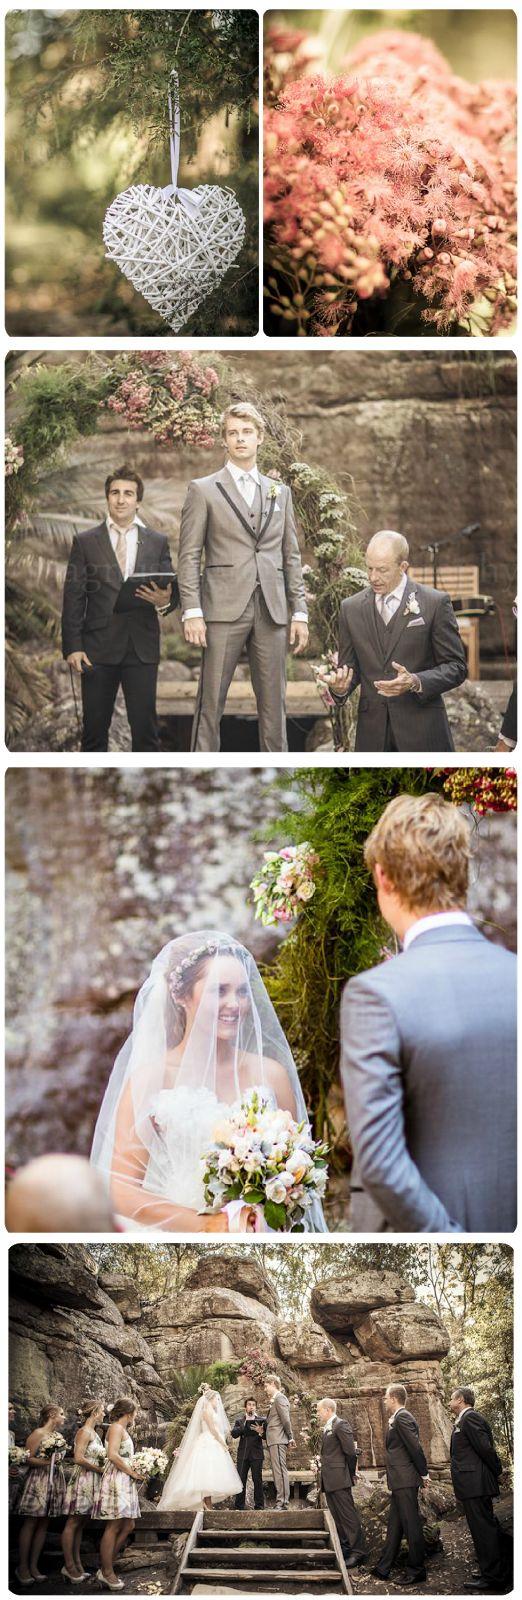 Rebecca Breeds Luke Mitchell Wedding Video